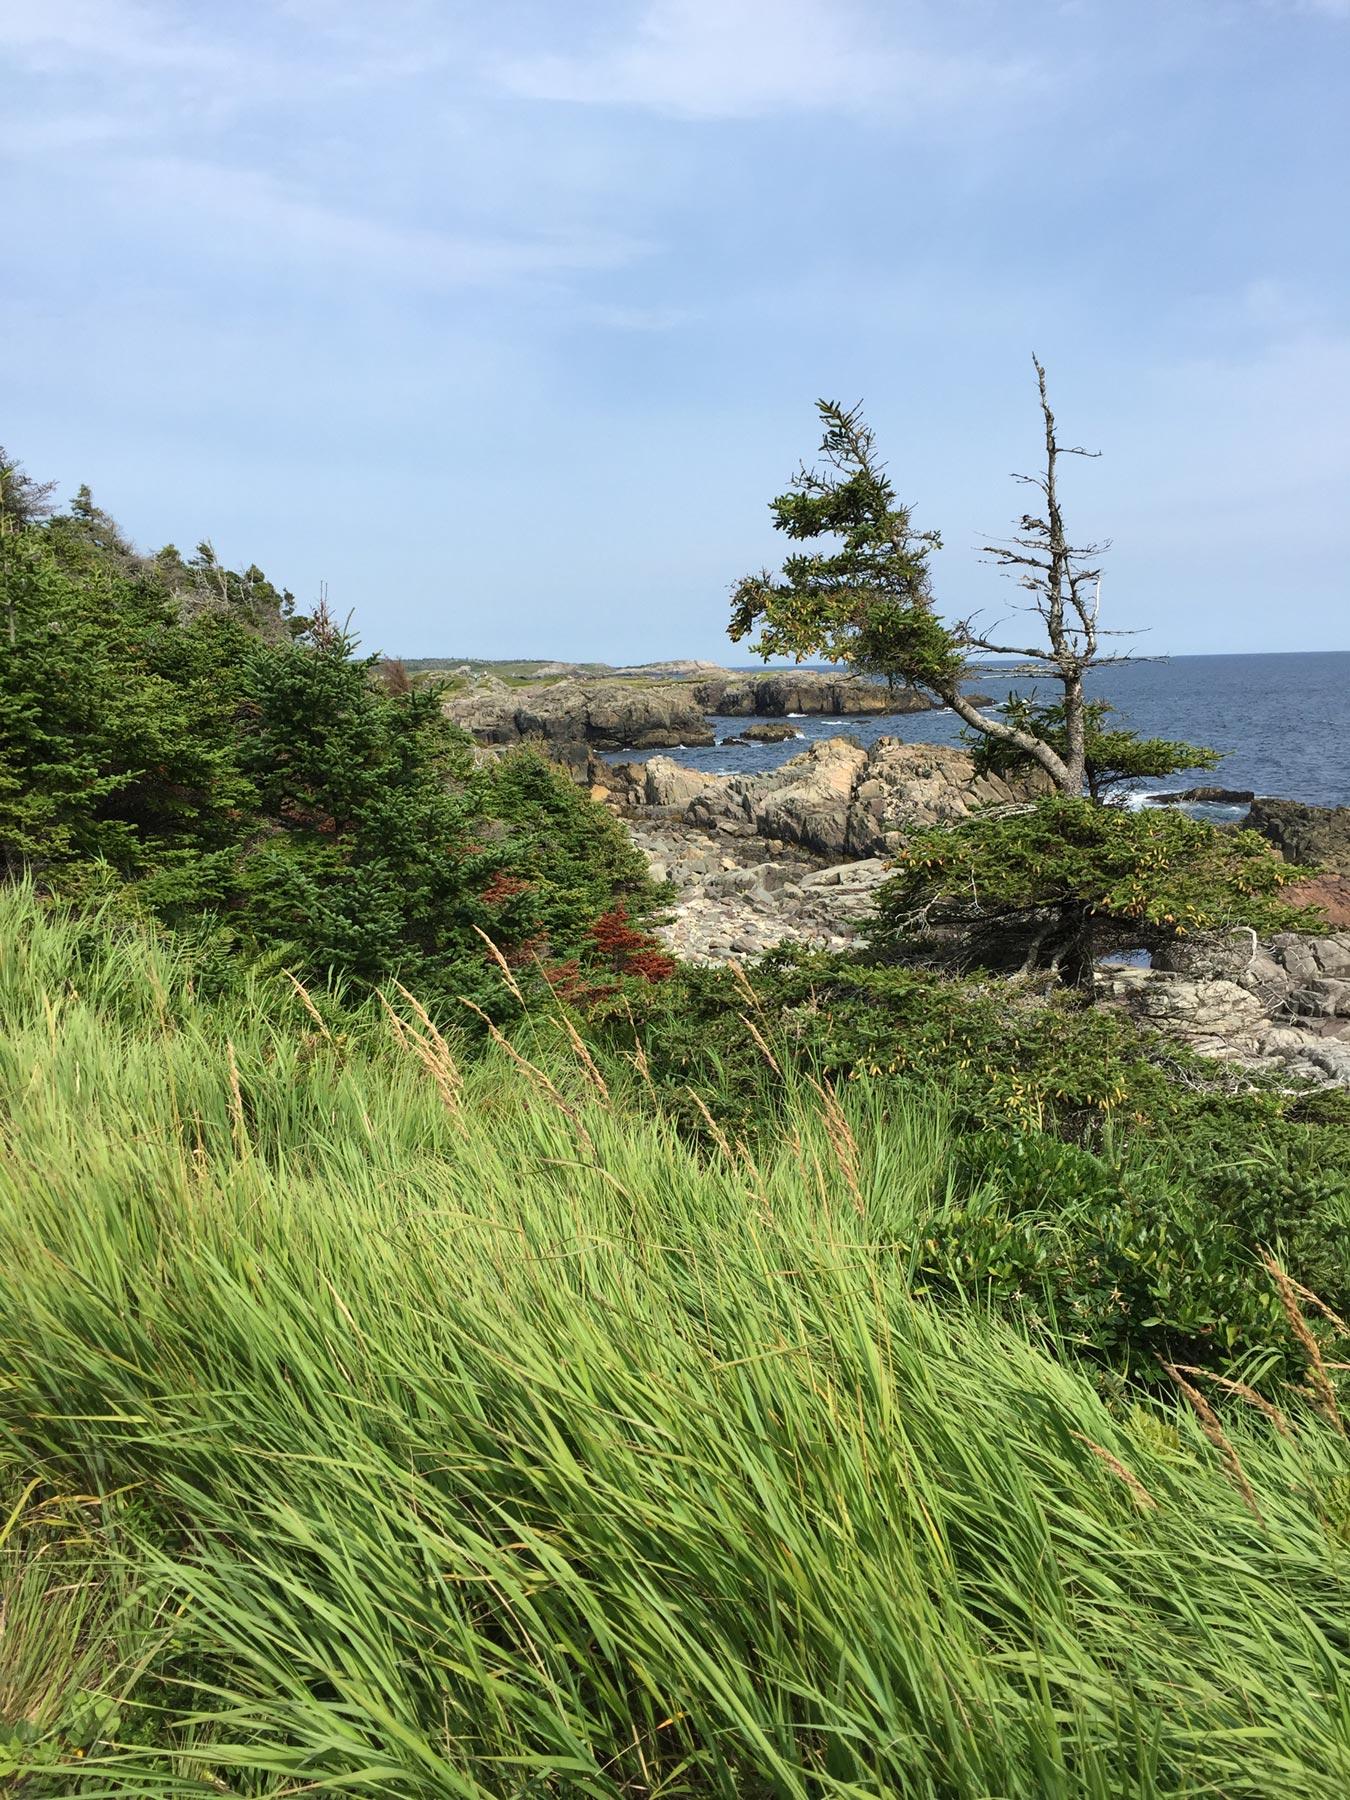 21-09-2018-Cape-Breton.jpg